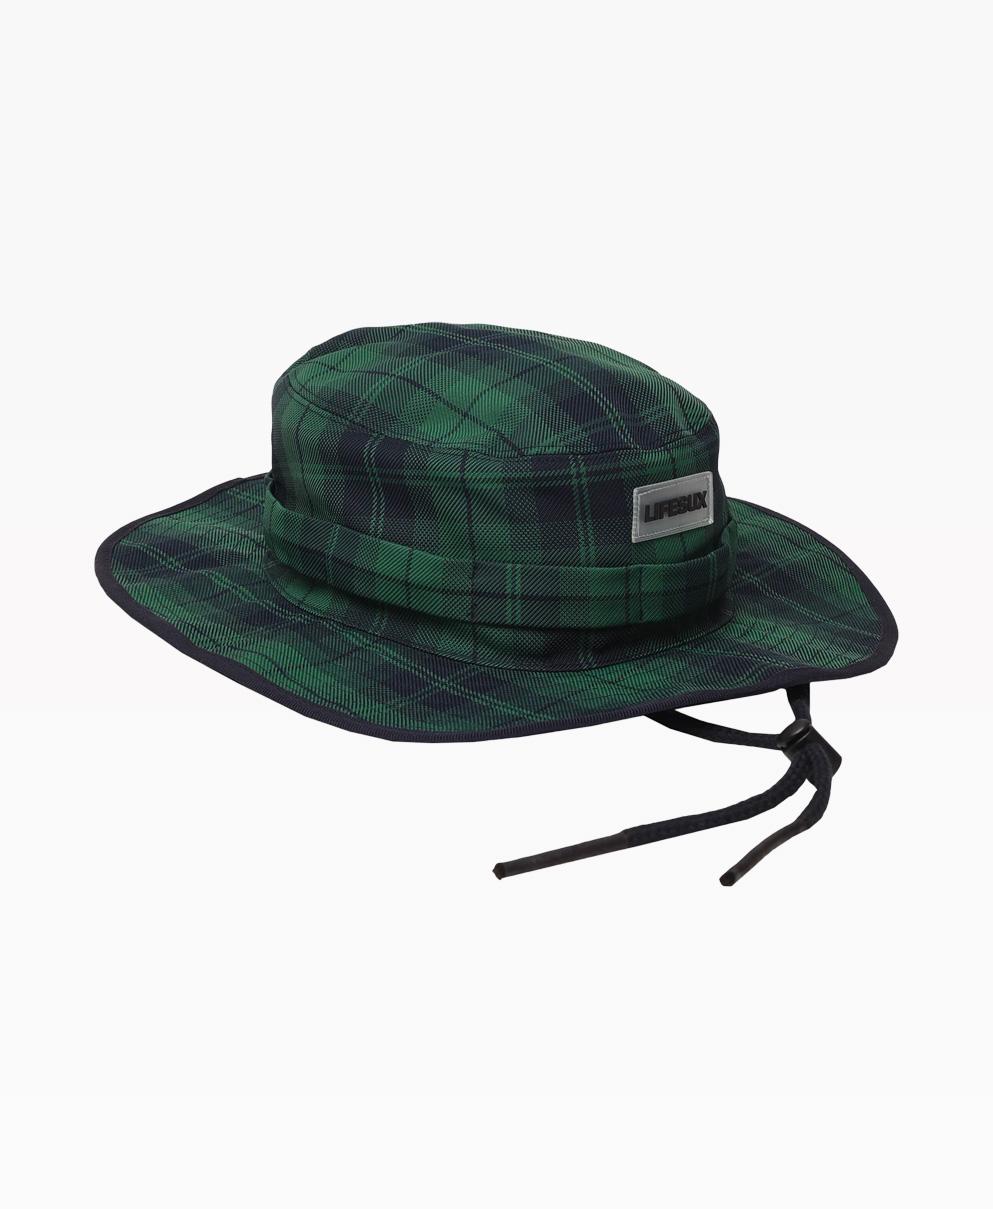 Lifesux Safari Hat